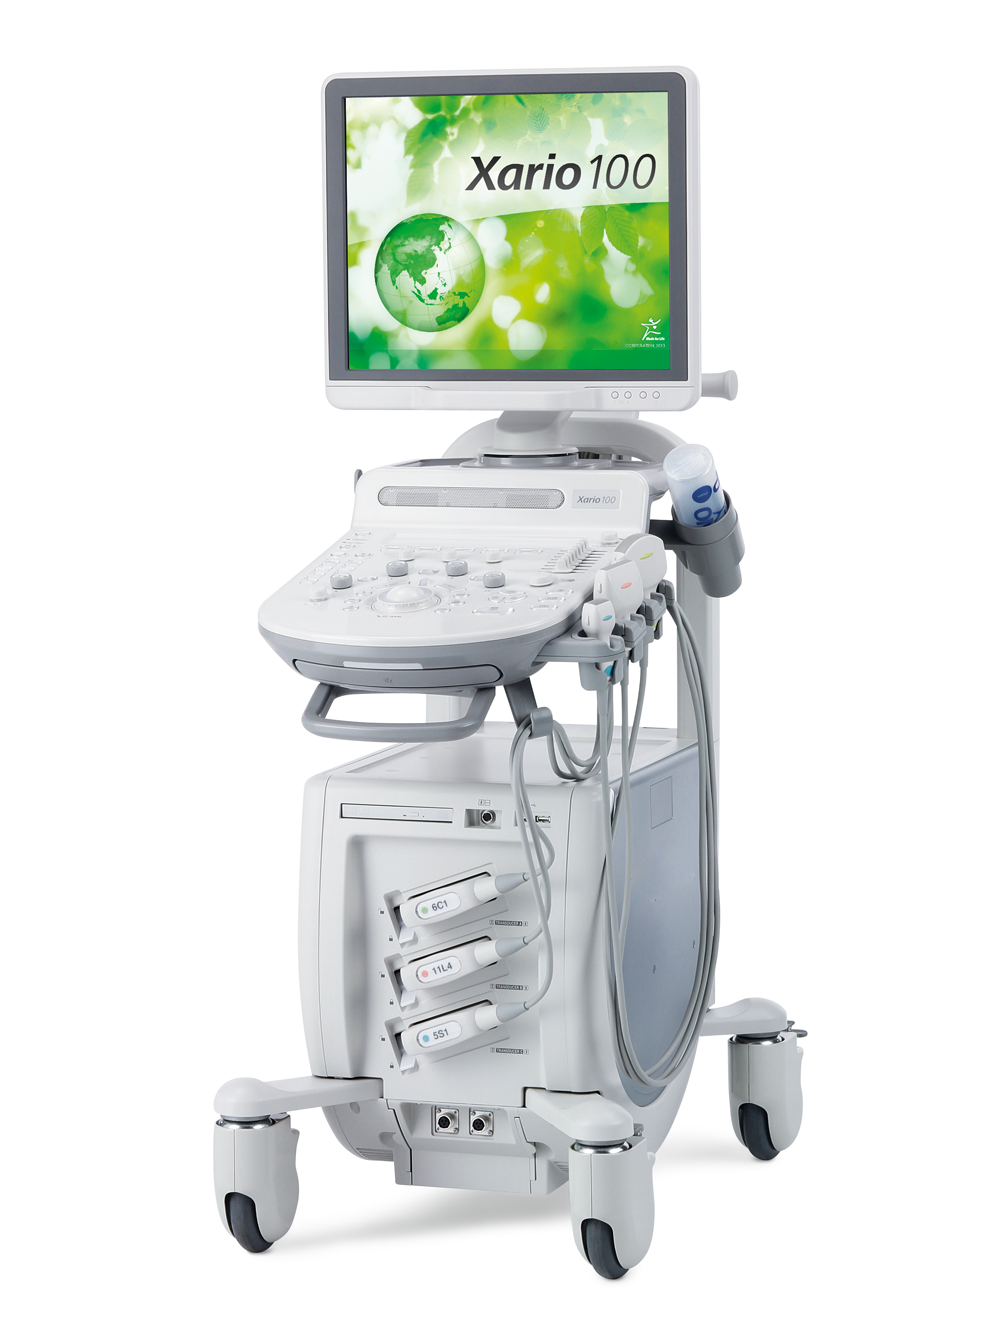 toshiba sonography machine